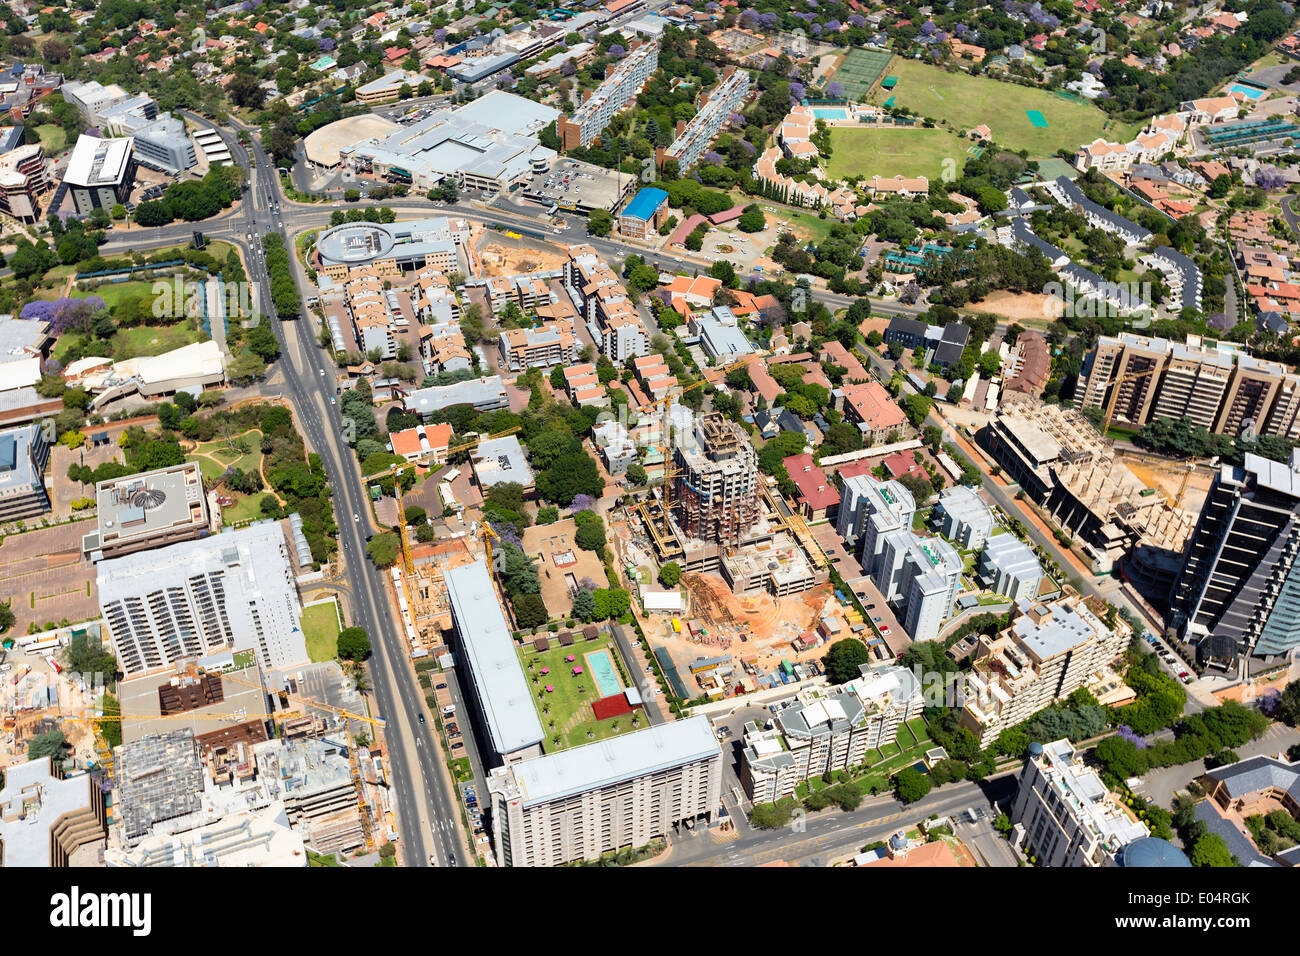 Vista aérea de Sandton, edificios de gran altura, Johannesburgo, Sudáfrica. Imagen De Stock